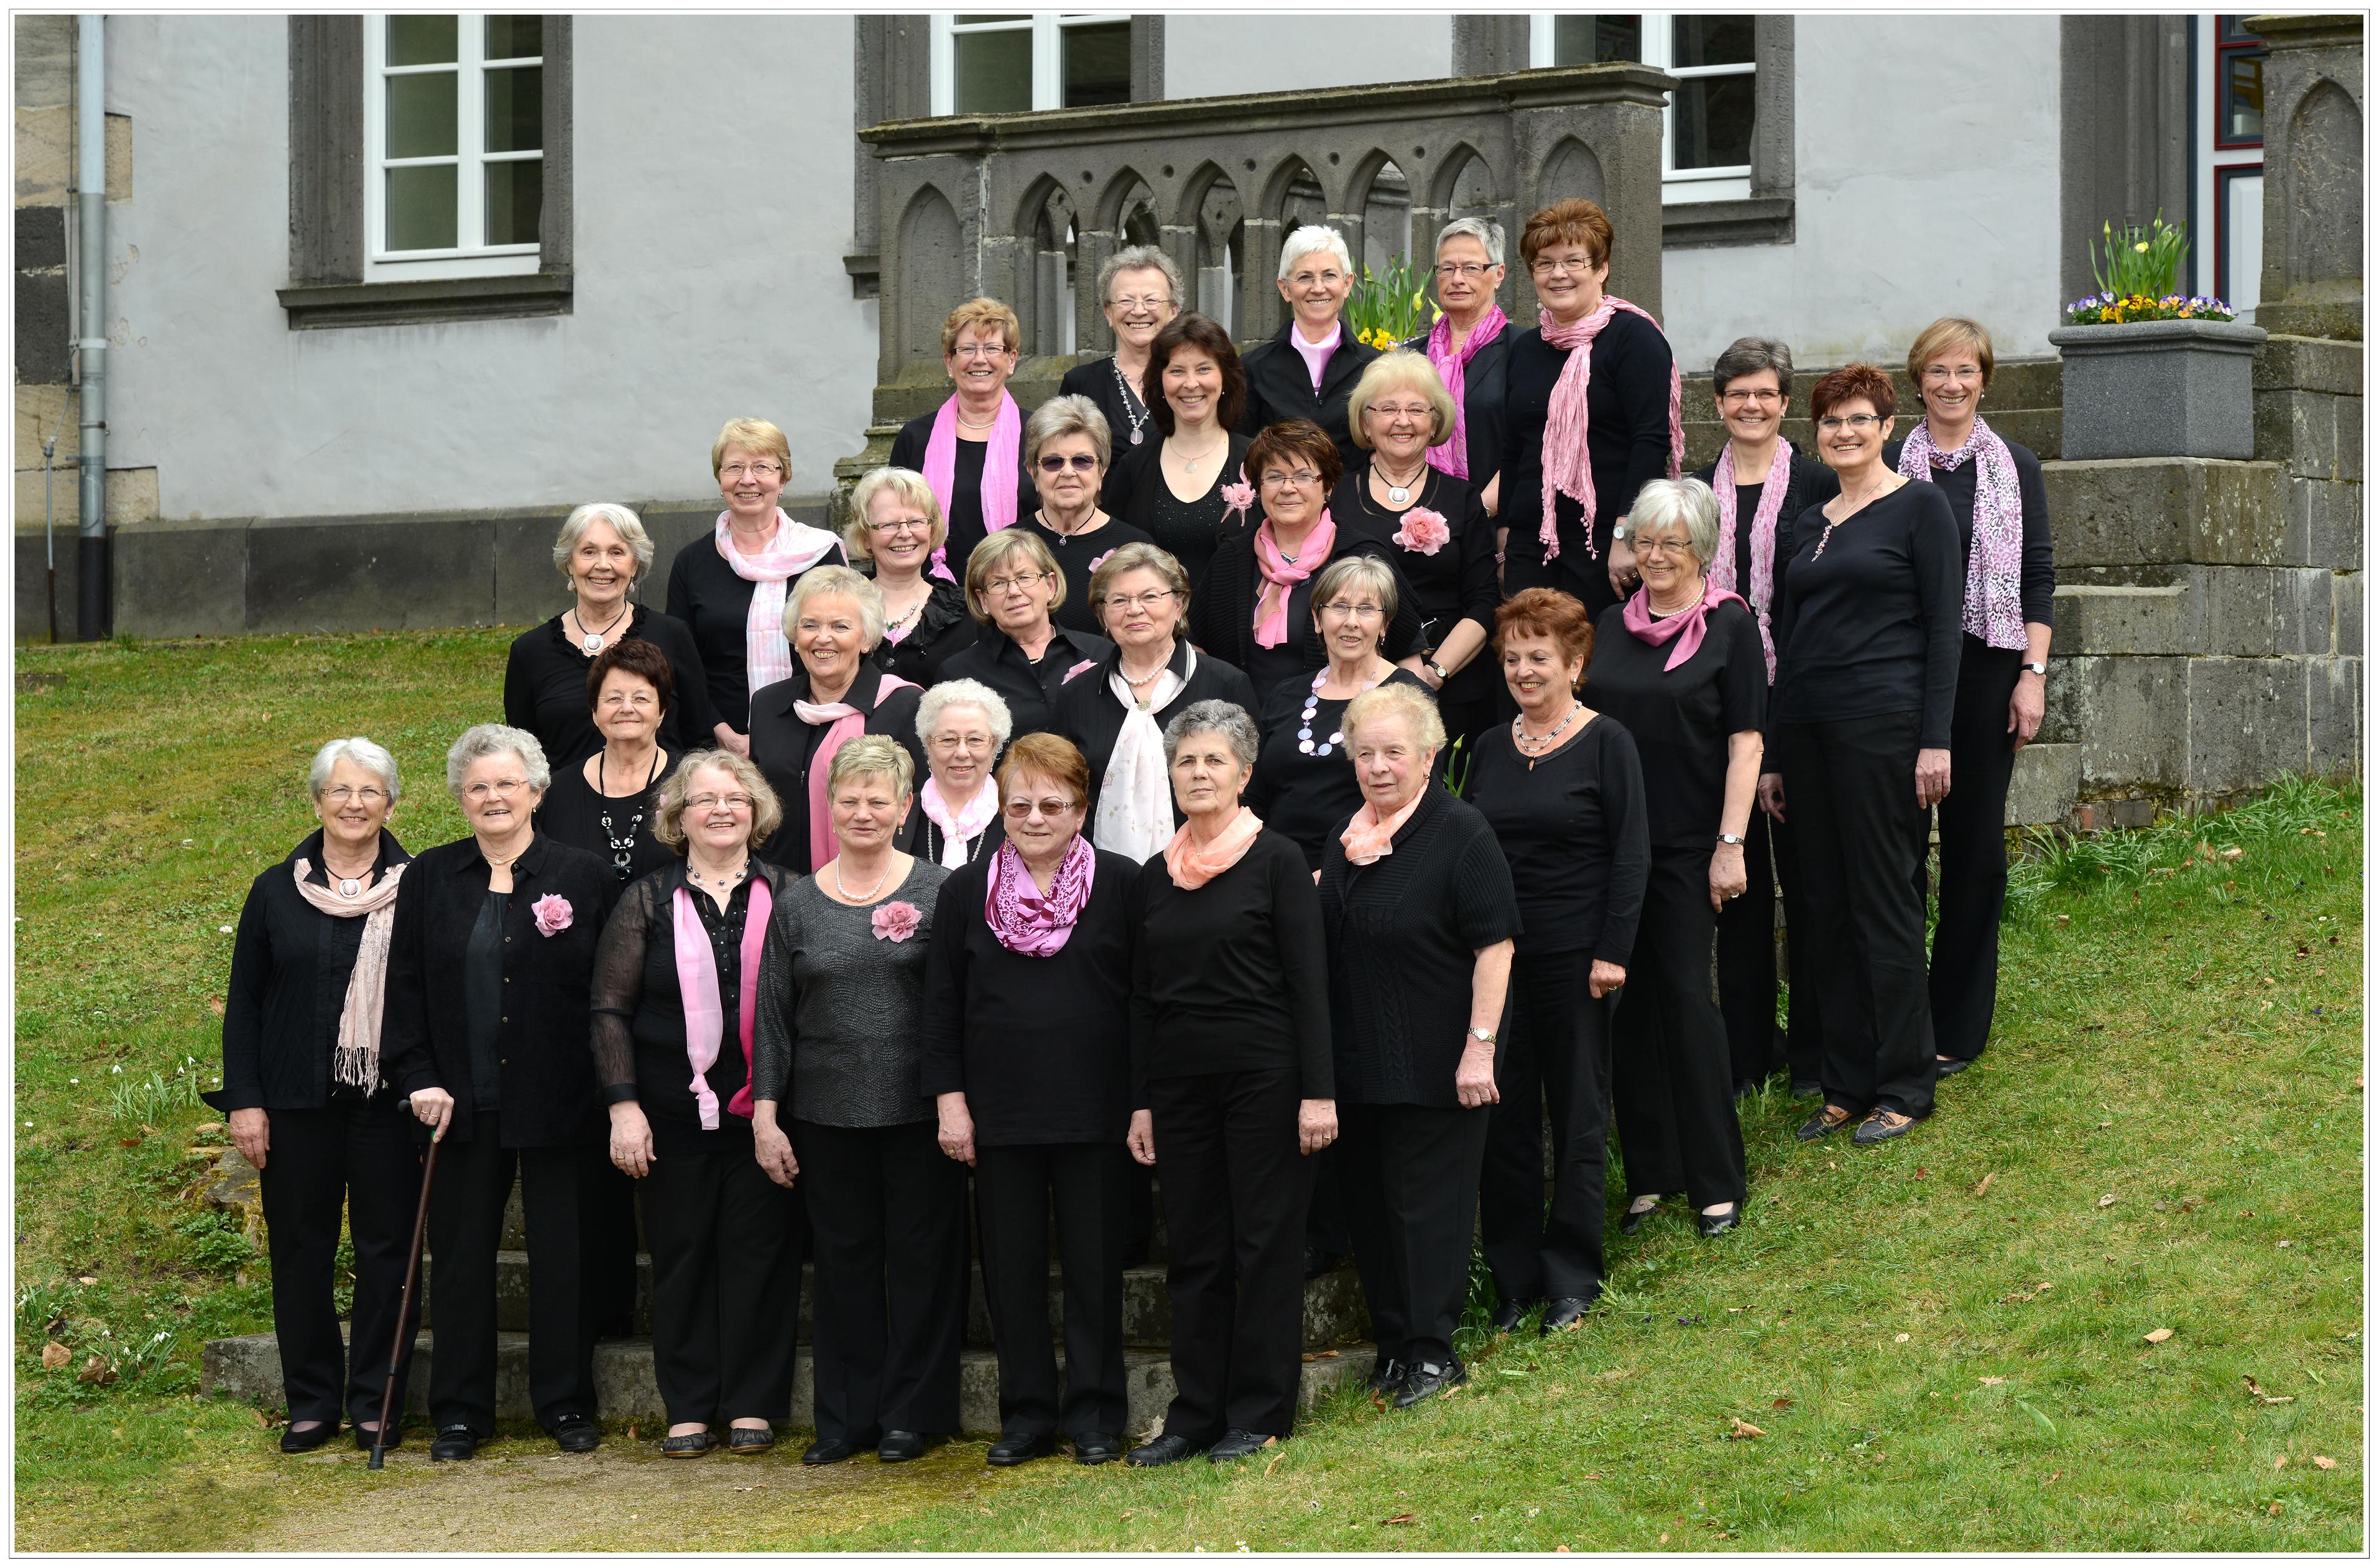 Frauenchor (Foto: Ulrike Richter-Lies)